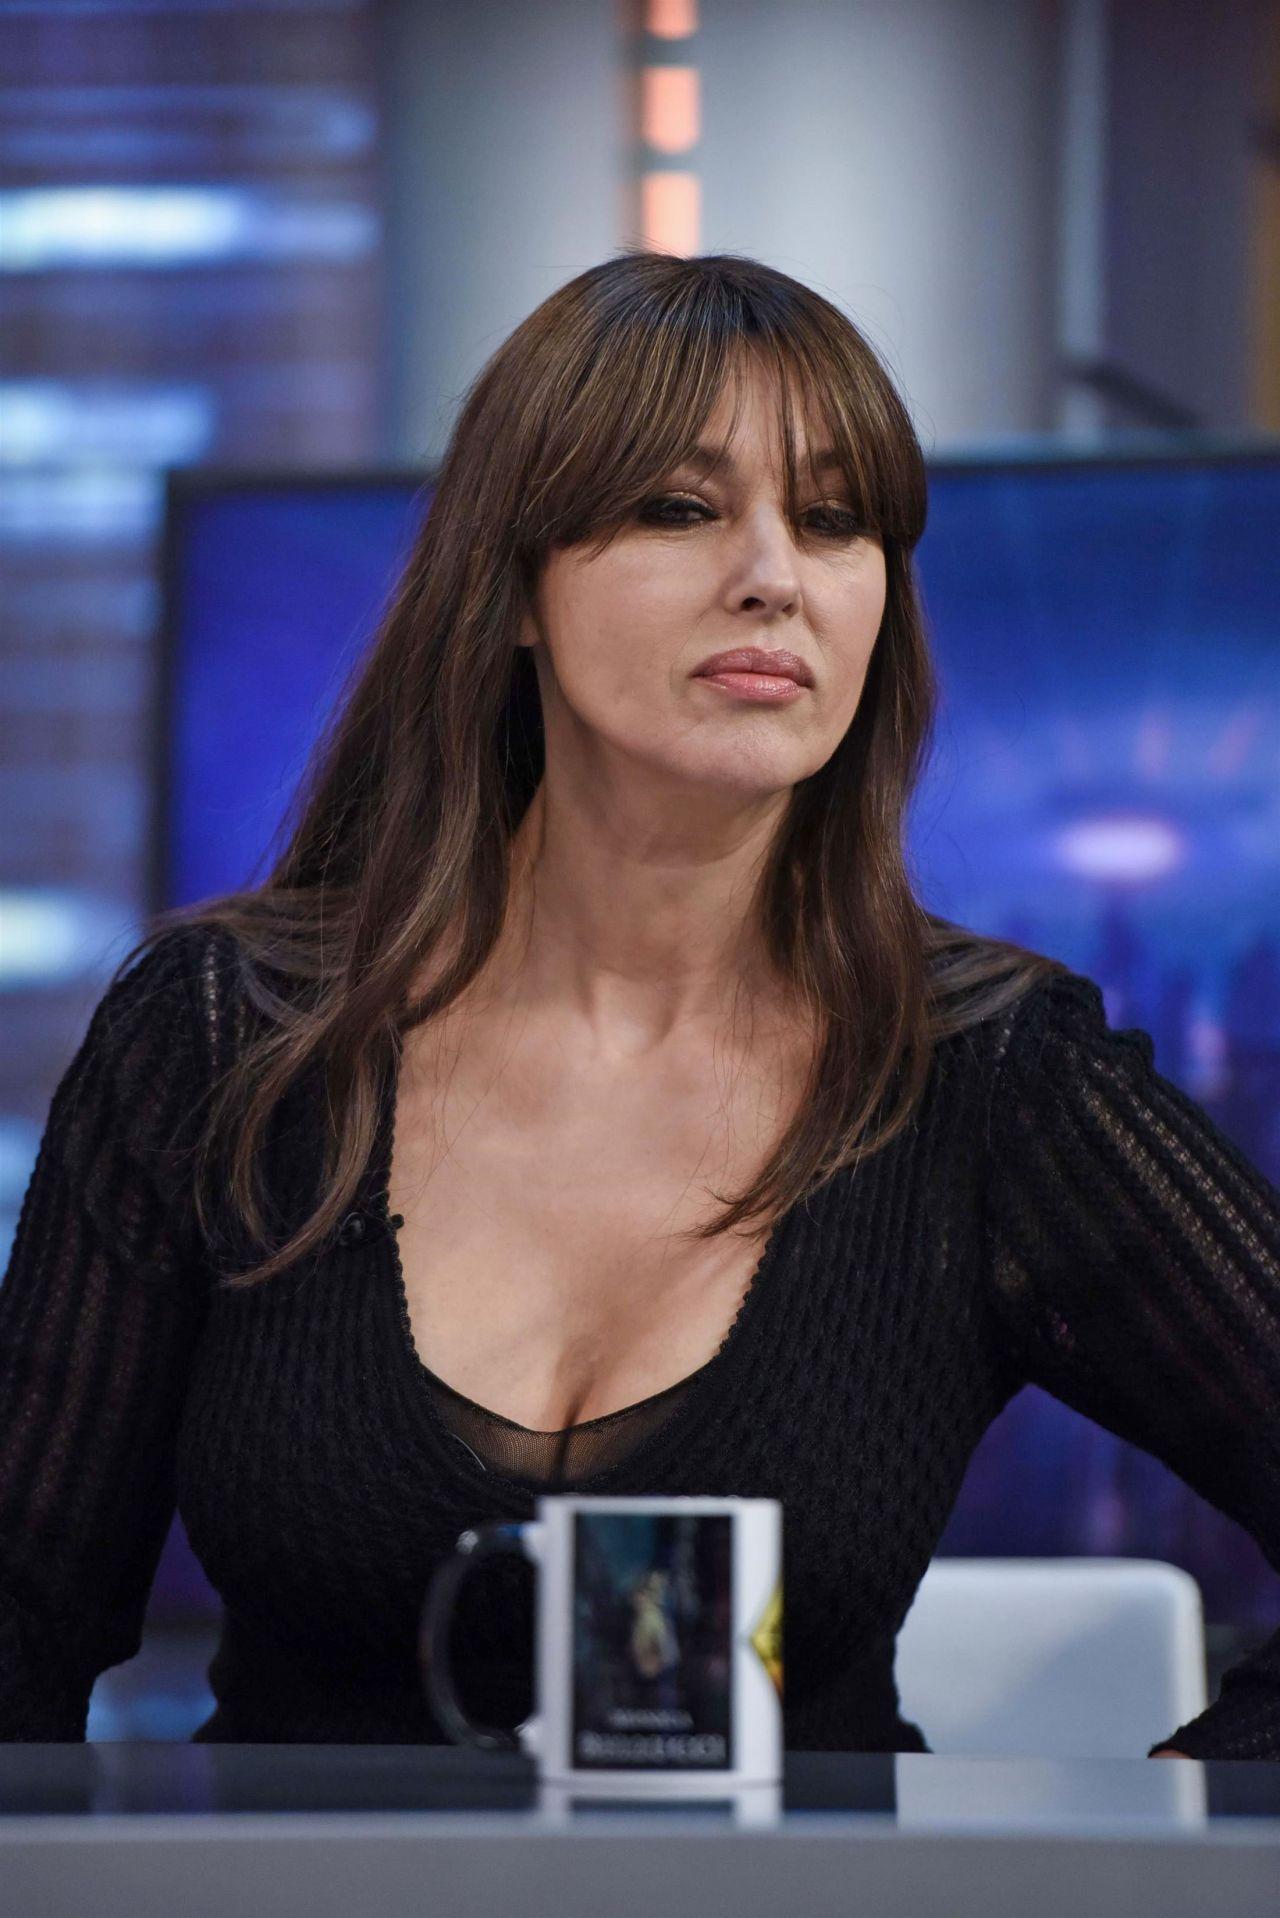 Monica Bellucci Appeared on El Hormiguero TV Show in ... Stefanie Scott